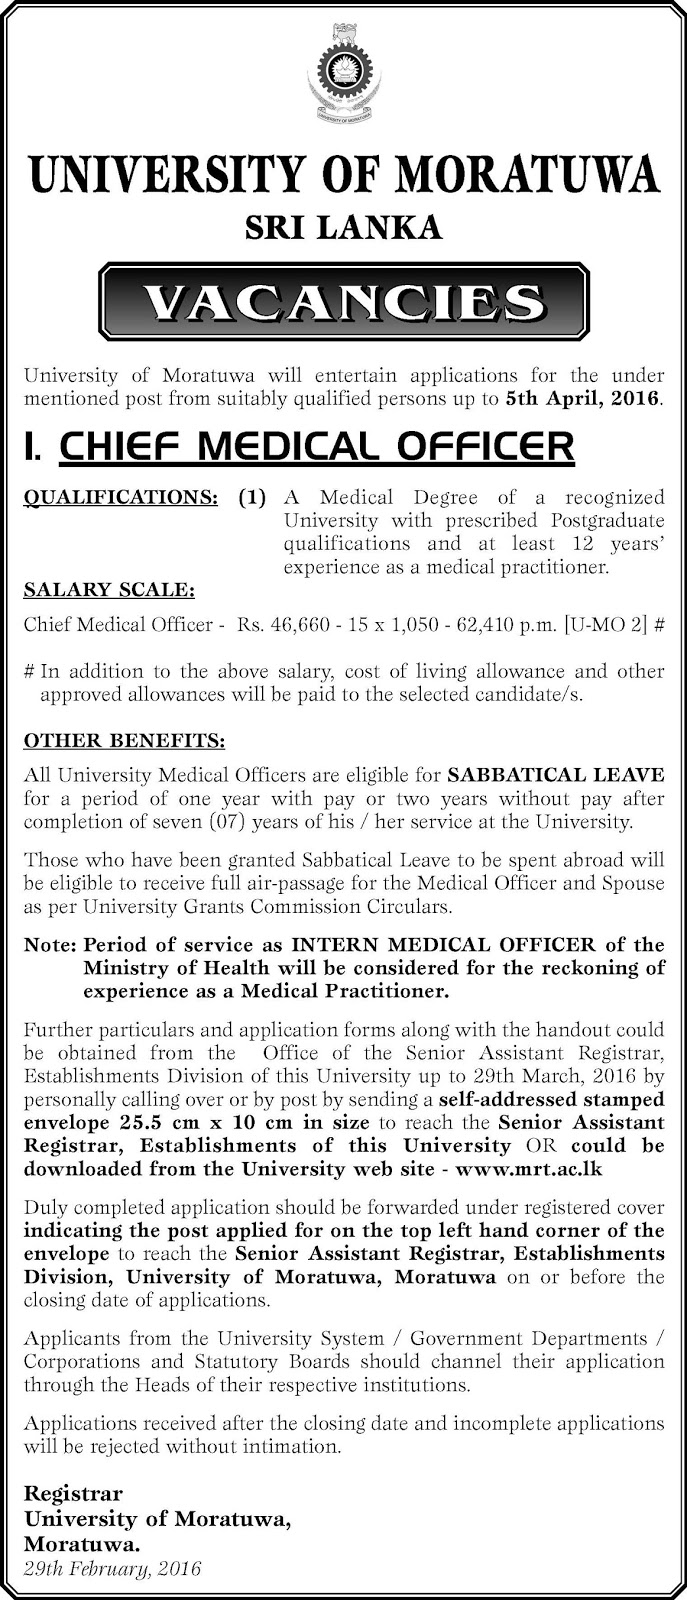 Vacancies - Cheif Medical Officer - University of Moratuwa